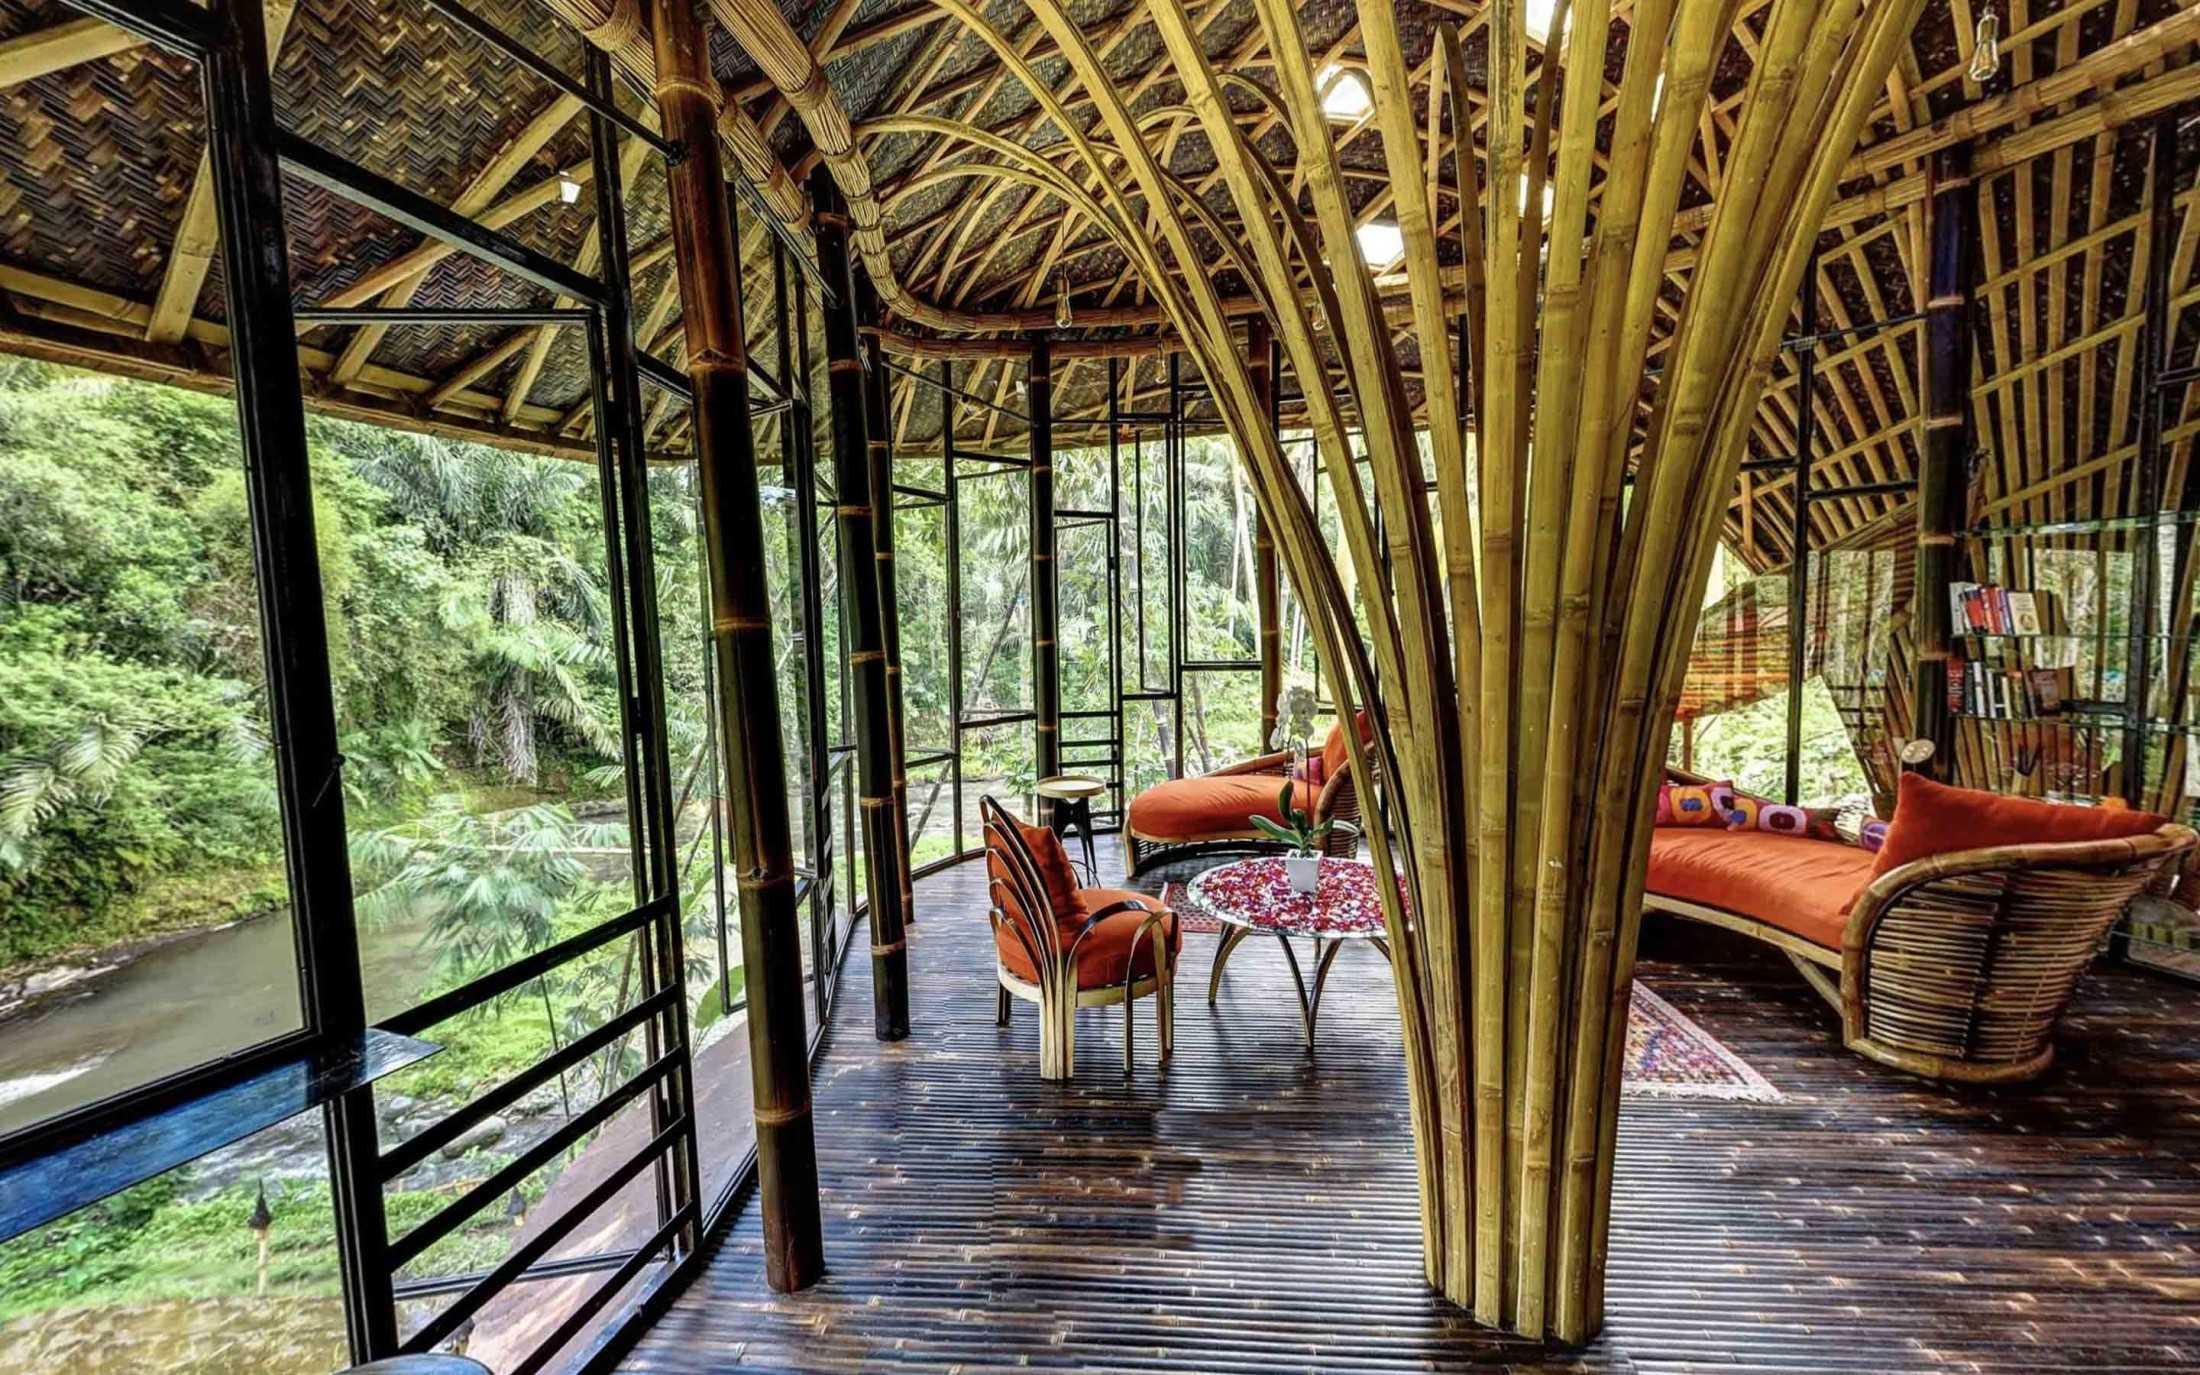 Agung Budi Raharsa | Architecture & Engineering Riverbend Bamboo House - Bali Bali, Indonesia Bali, Indonesia Agung-Budi-Raharsa-Riverbend-House-Bali  88715